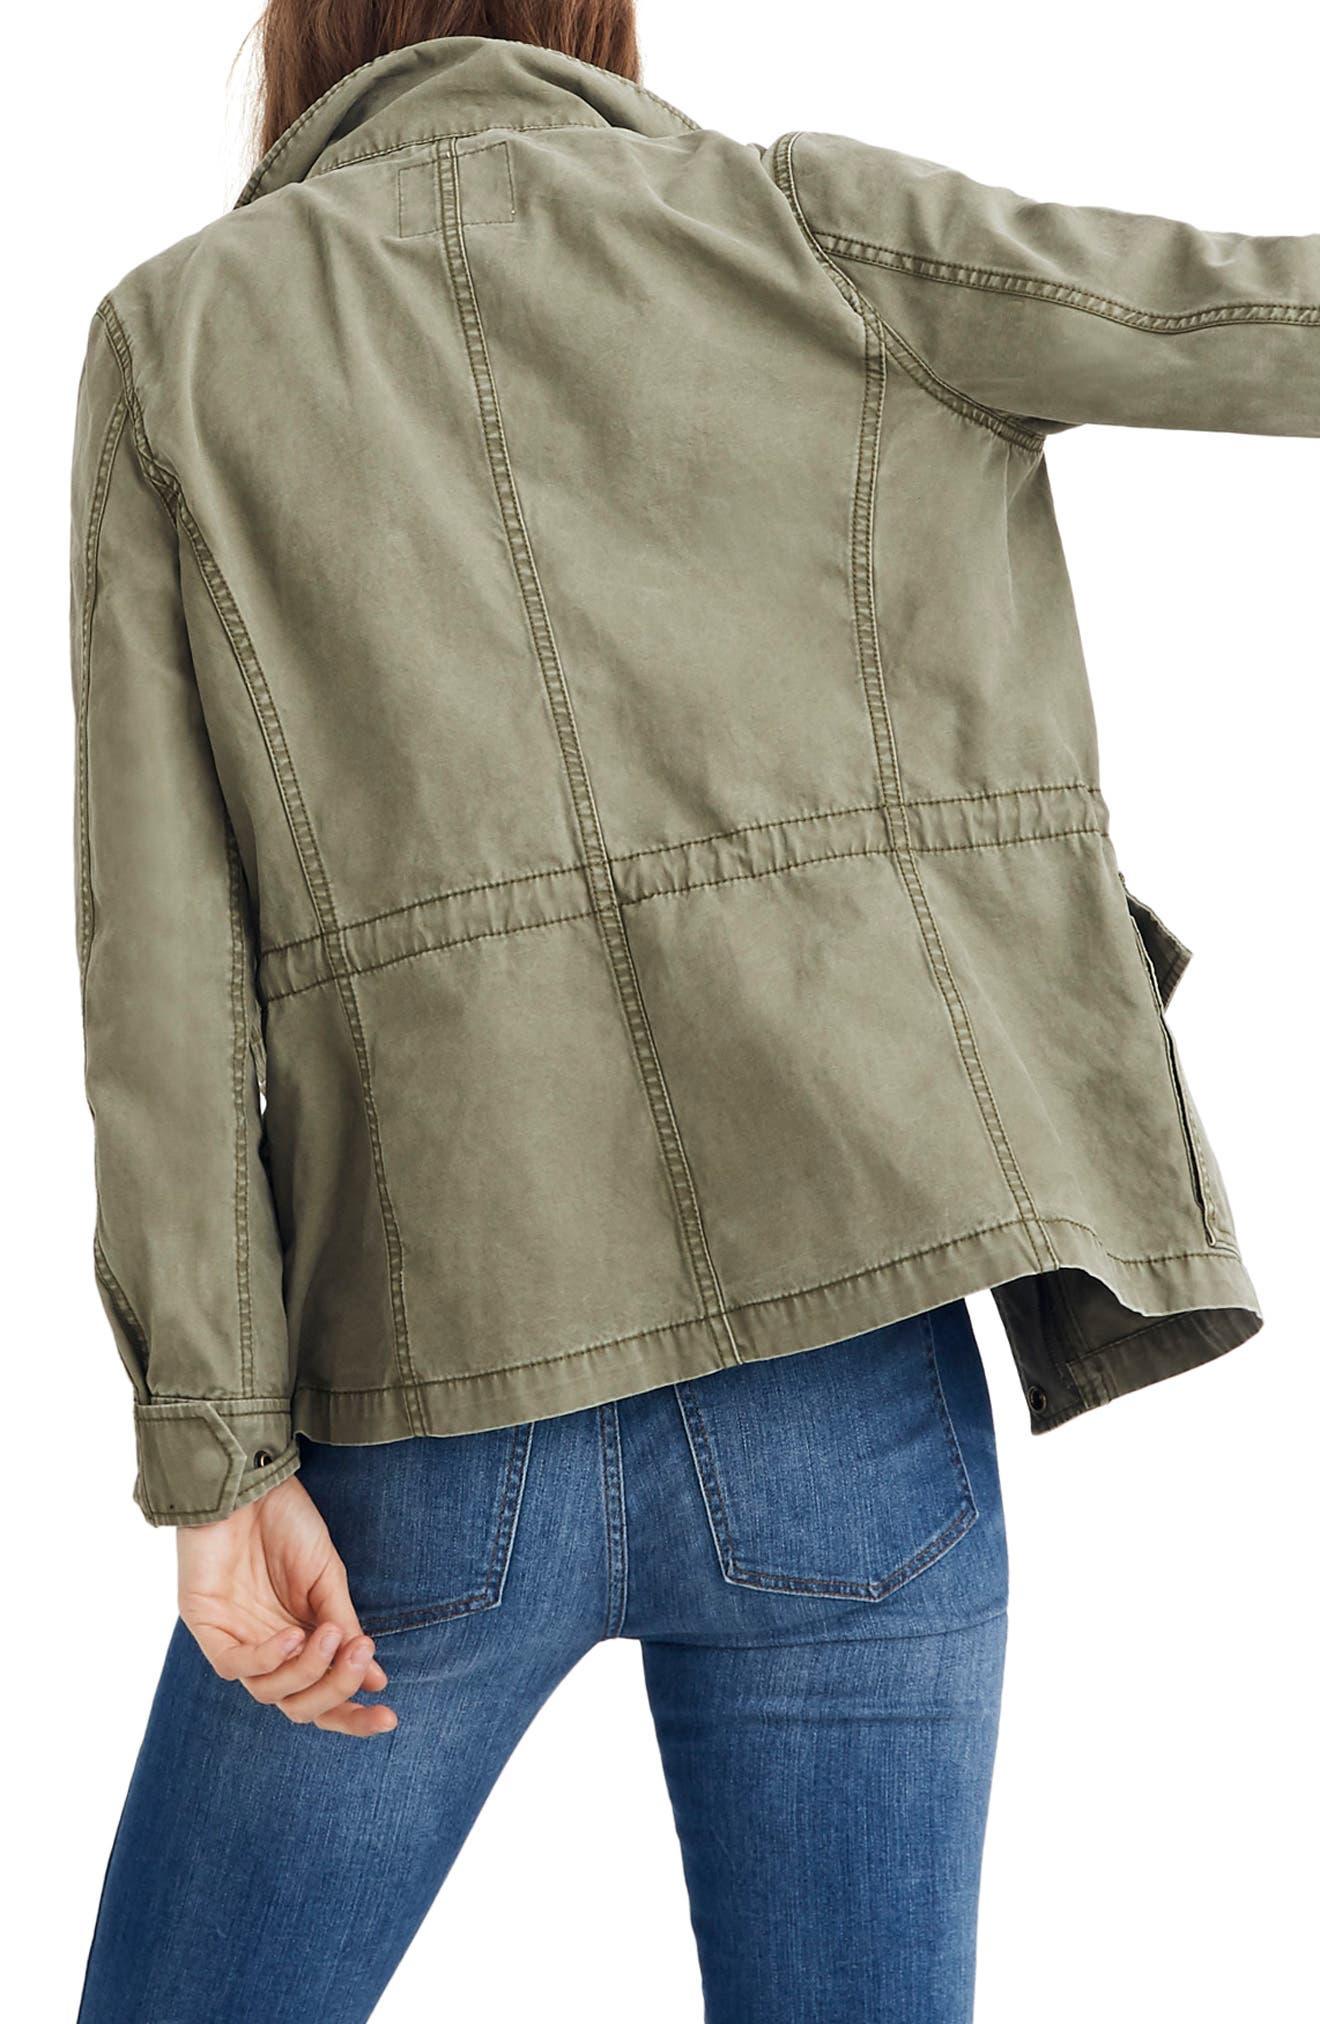 MADEWELL, Surplus Cotton Jacket, Alternate thumbnail 4, color, DESERT OLIVE